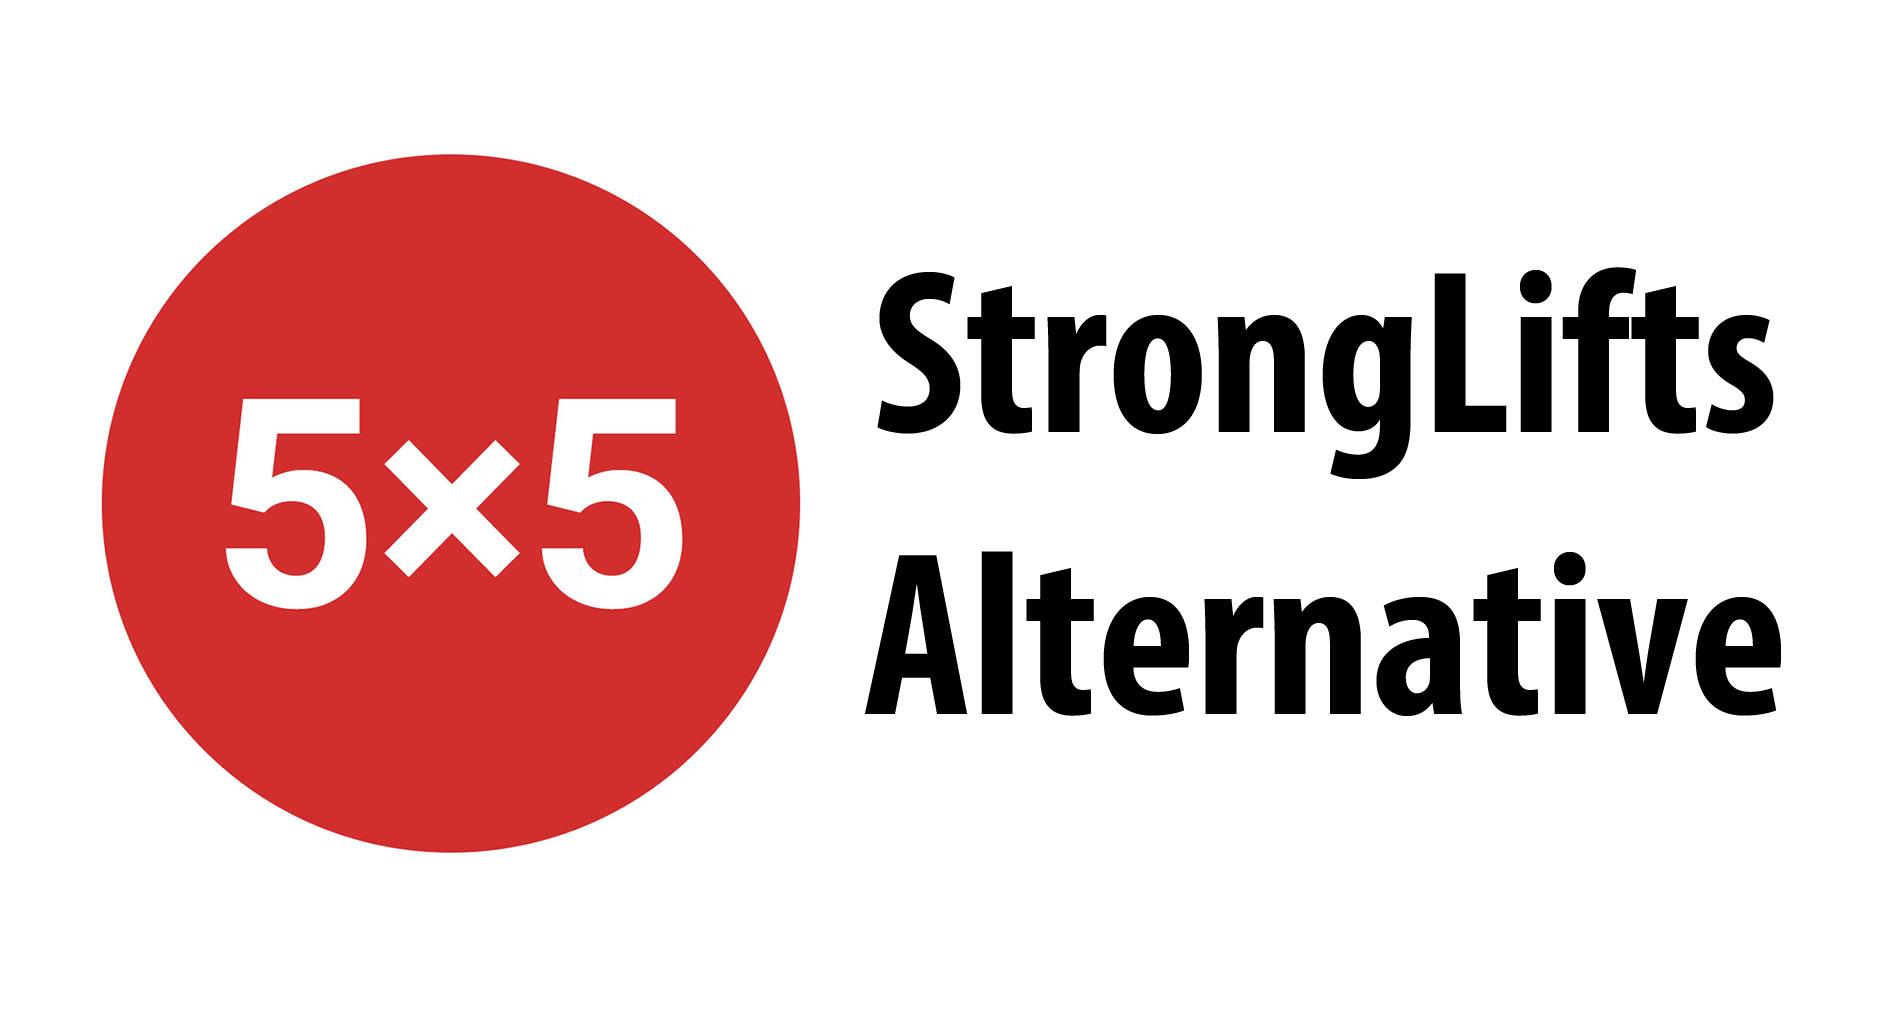 Stronglifts 5x5 Alternative Workout